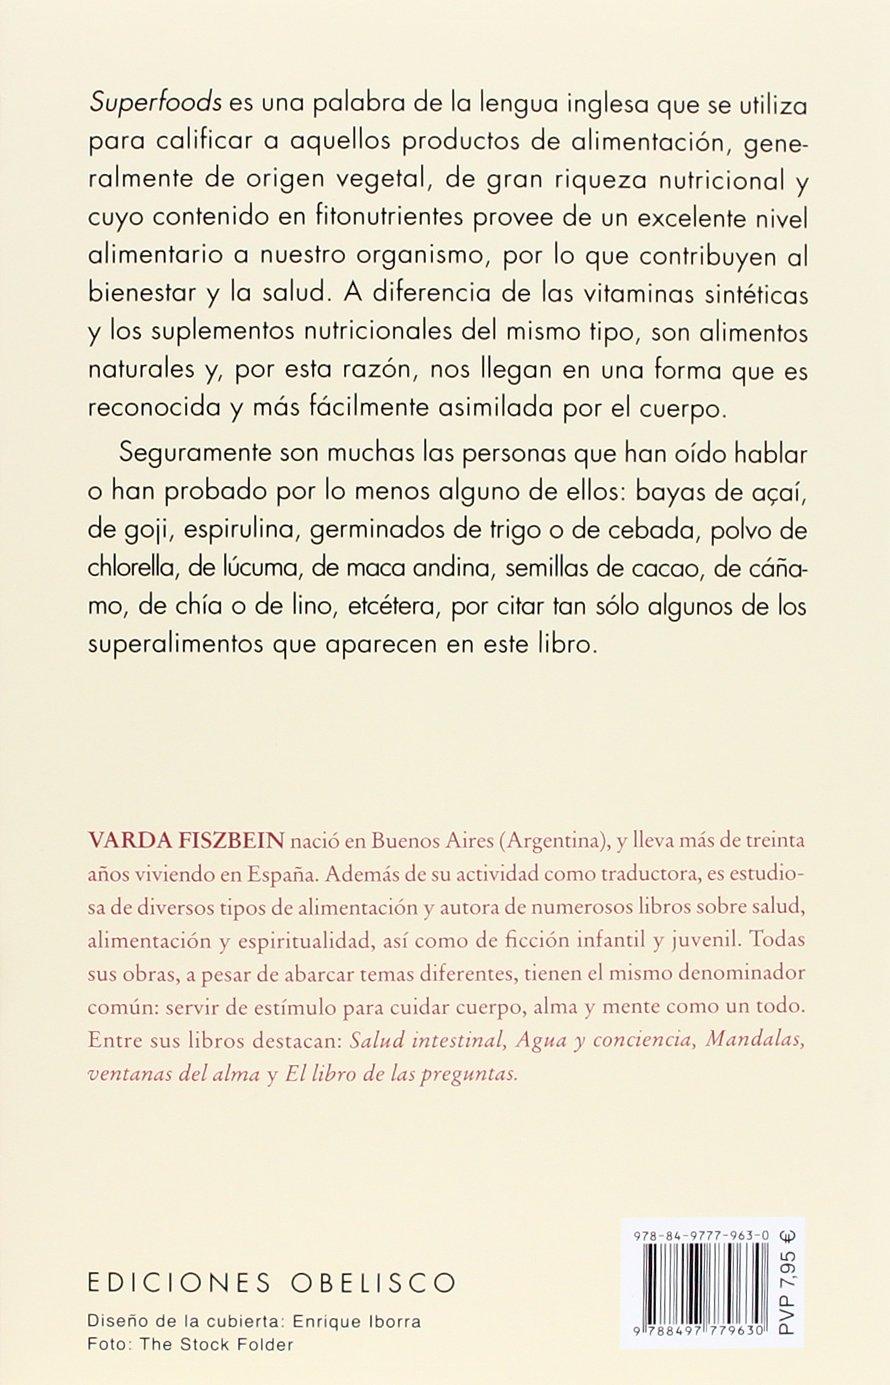 Superalimentos (Spanish Edition): Varda Fiszbein: 9788497779630: Amazon.com: Books